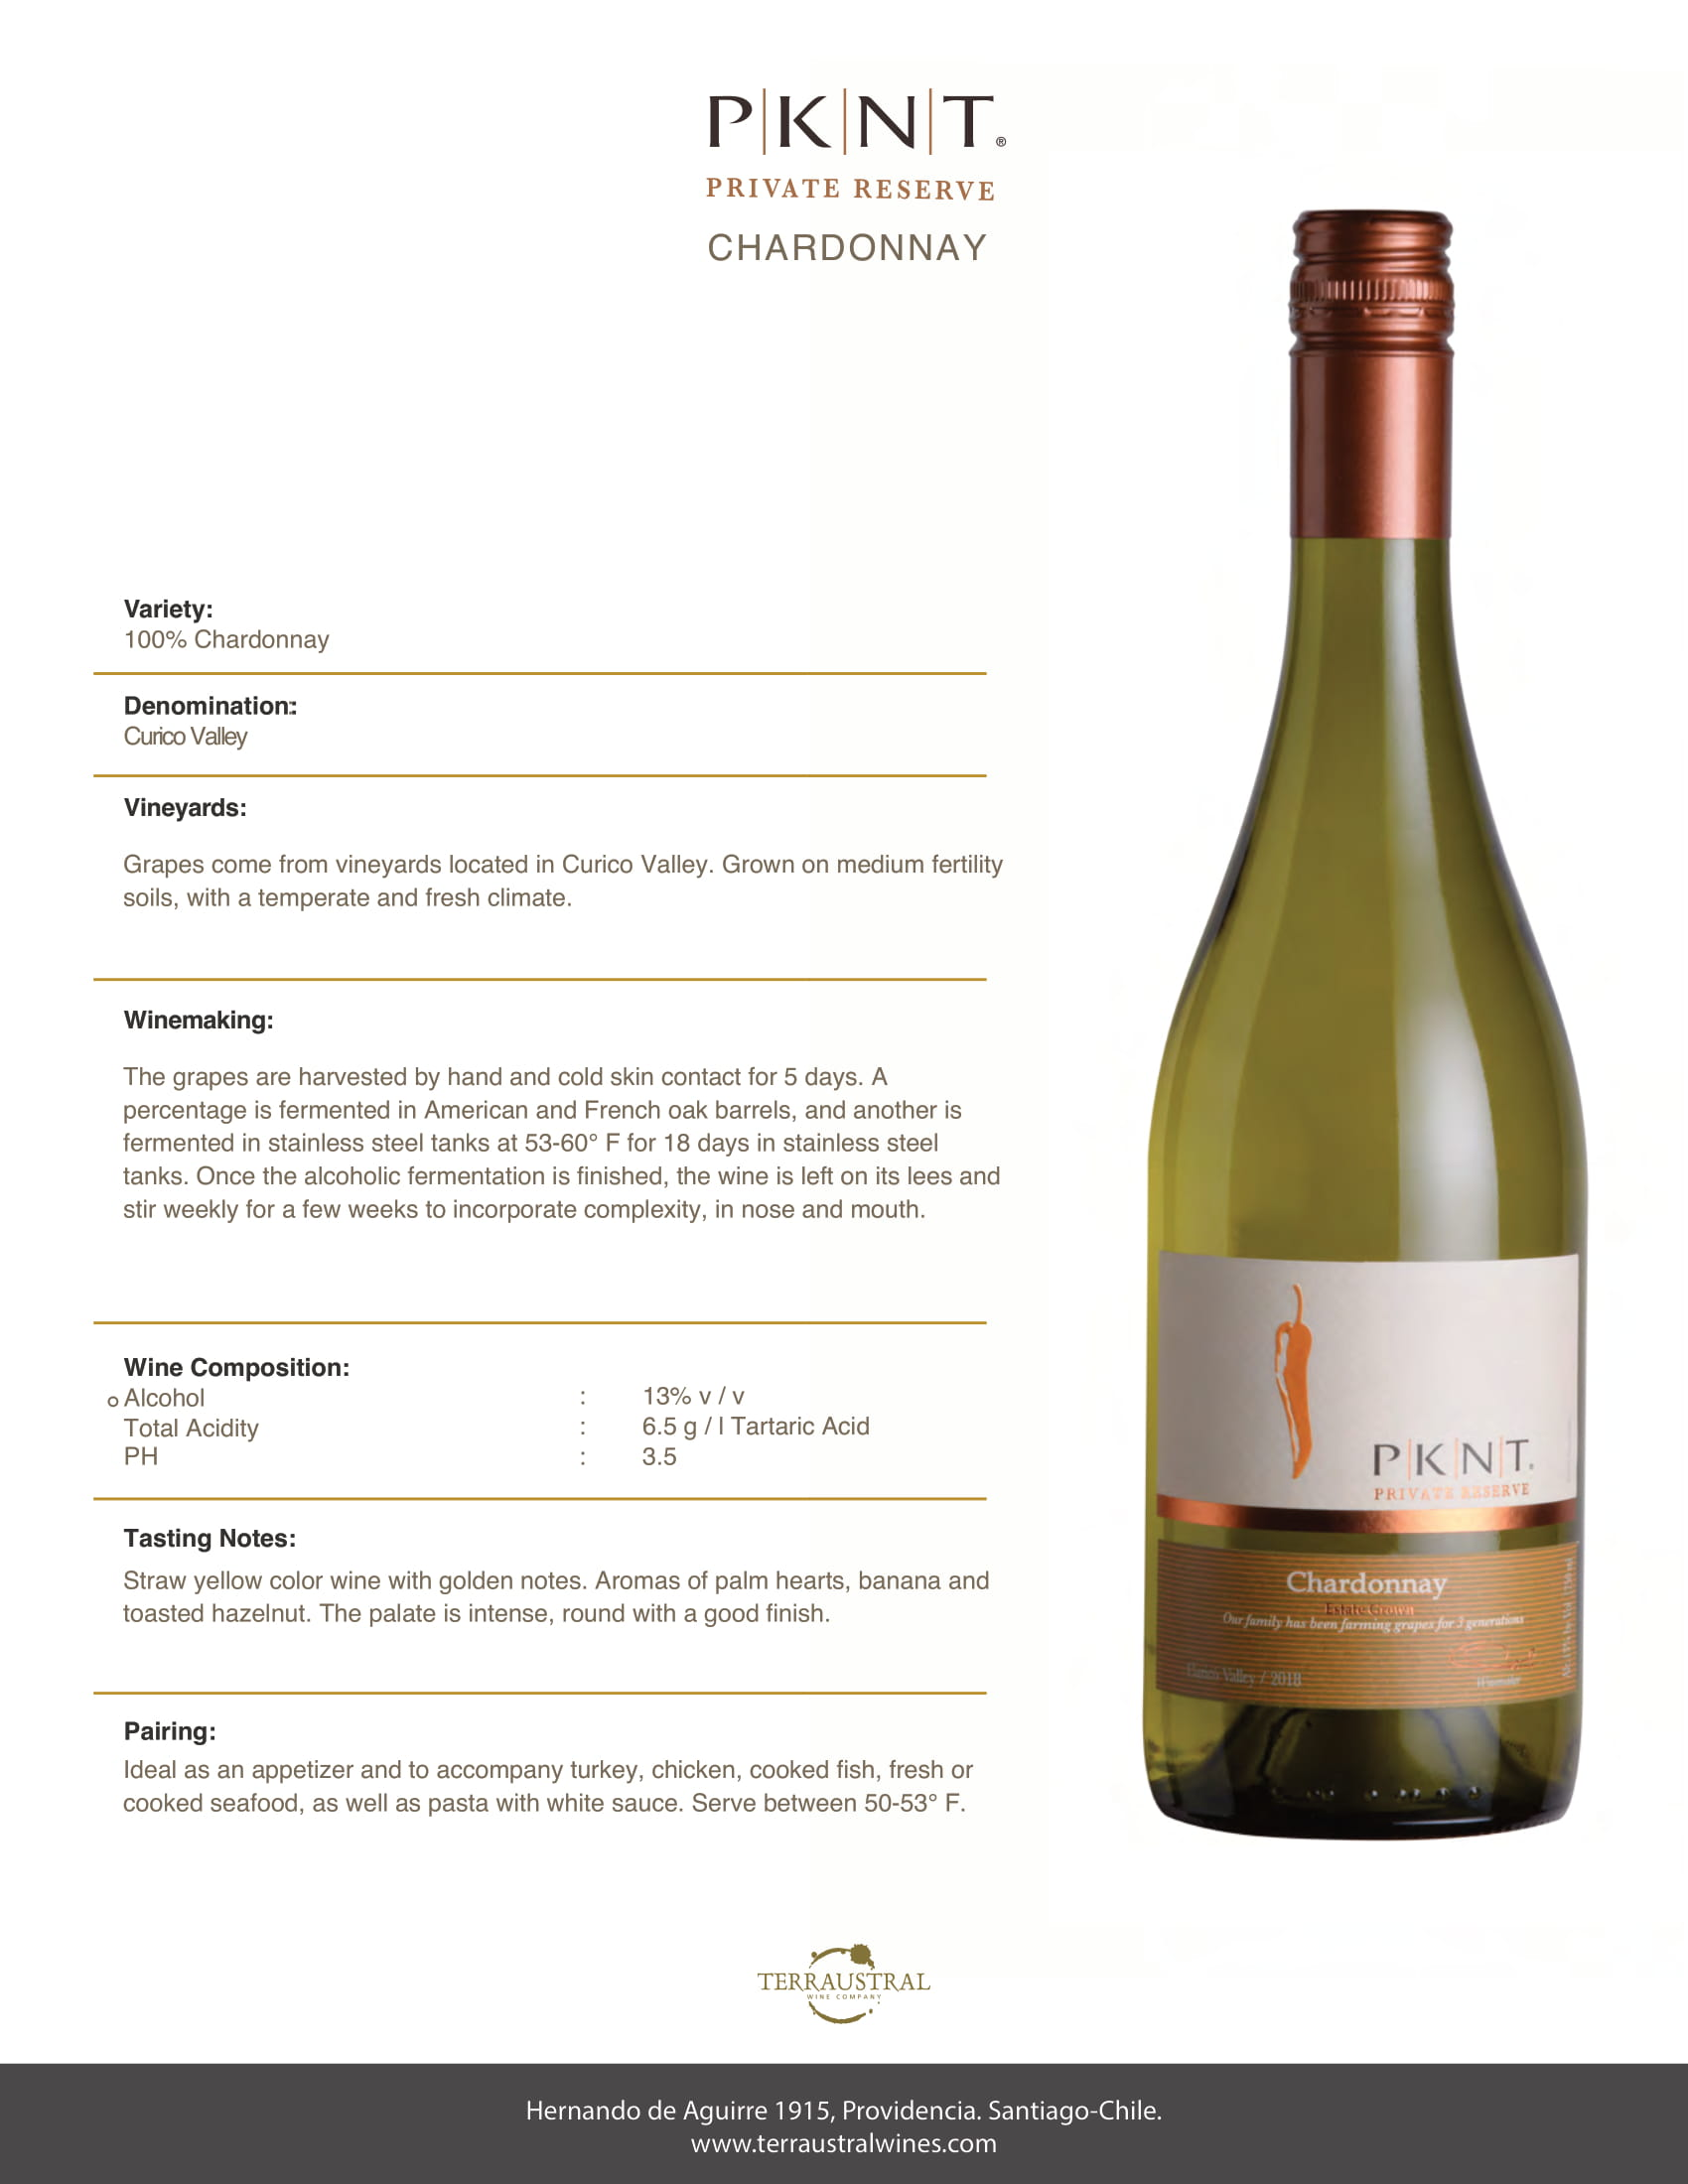 PKNT Chardonnay Reserve Tech Sheet